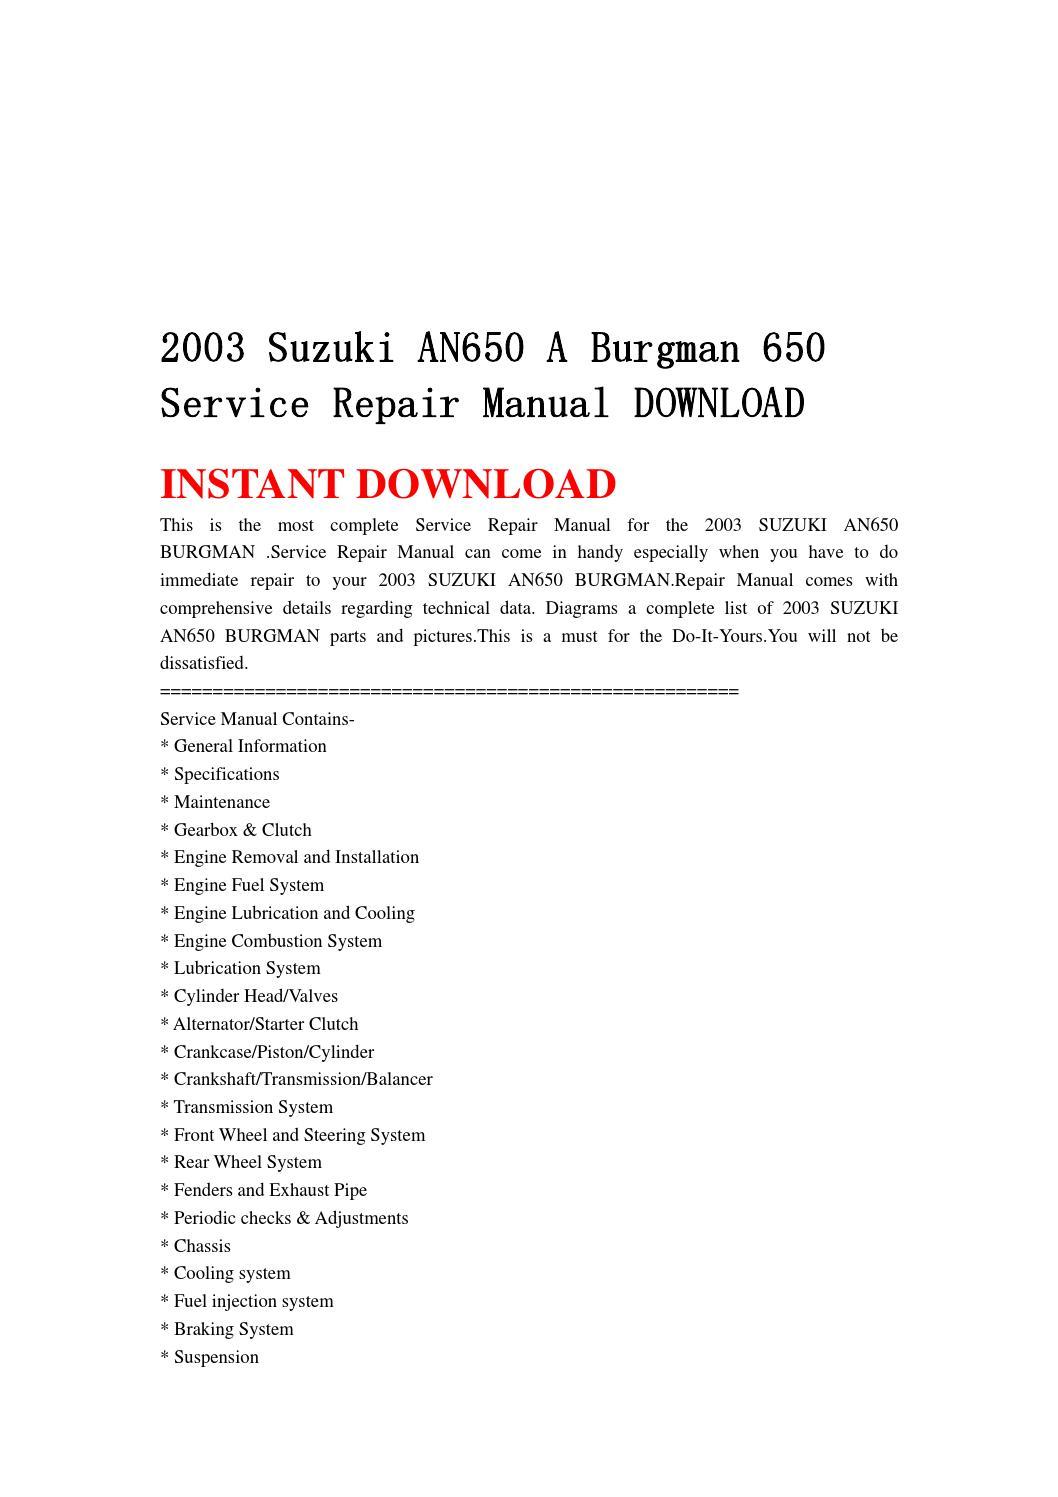 2003 suzuki an650 a burgman 650 service repair manual download by  jnshefjsne - issuu